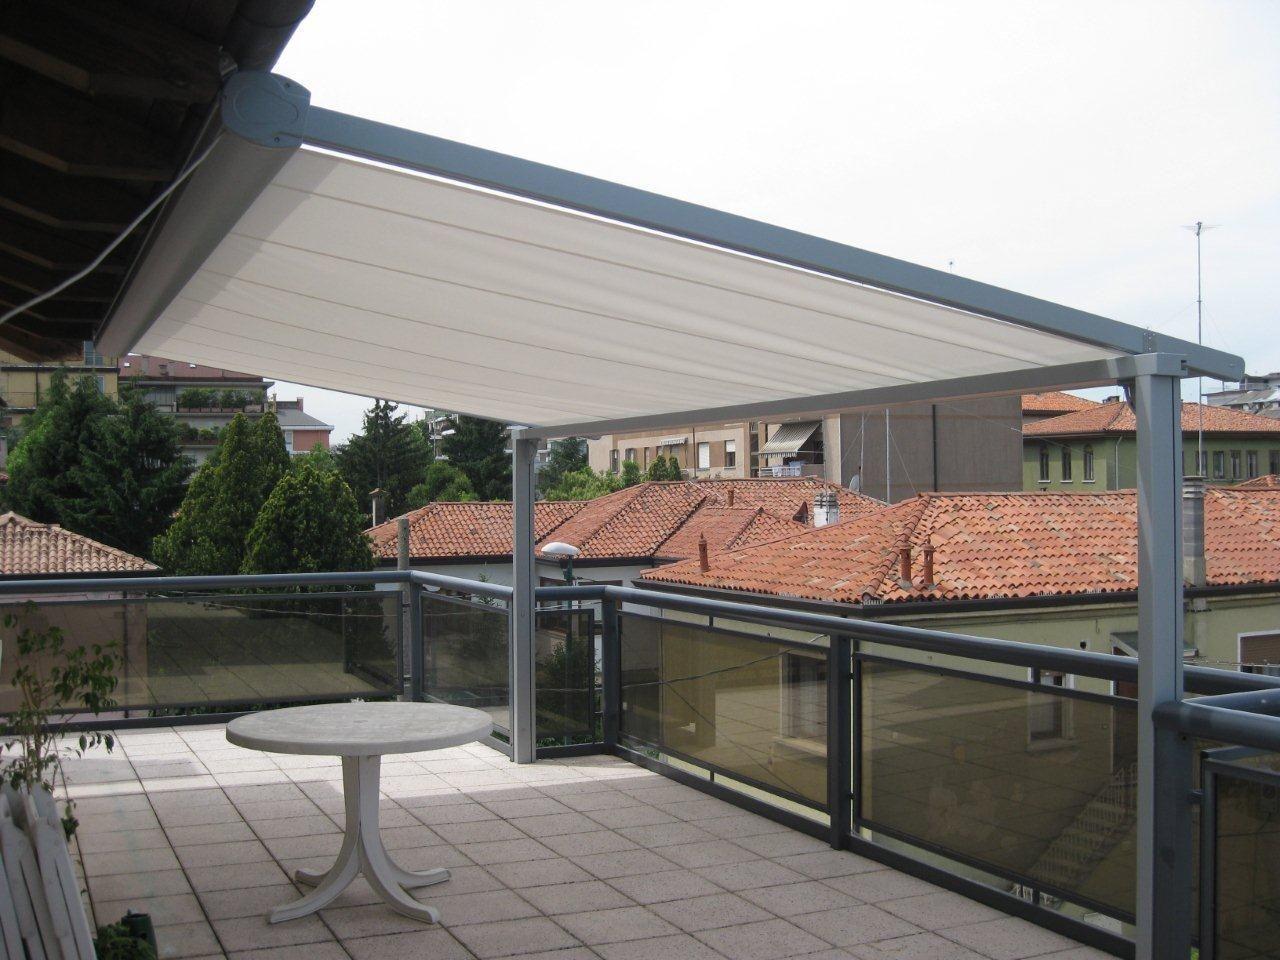 Modern conservatory design ideas - Minimalist Canvas Shade Pergola Modern House Design Ideas Steel Railing White Table Fun Pergola Canopy Ideas Awning Canopy Designs Modern Pergola Canopy